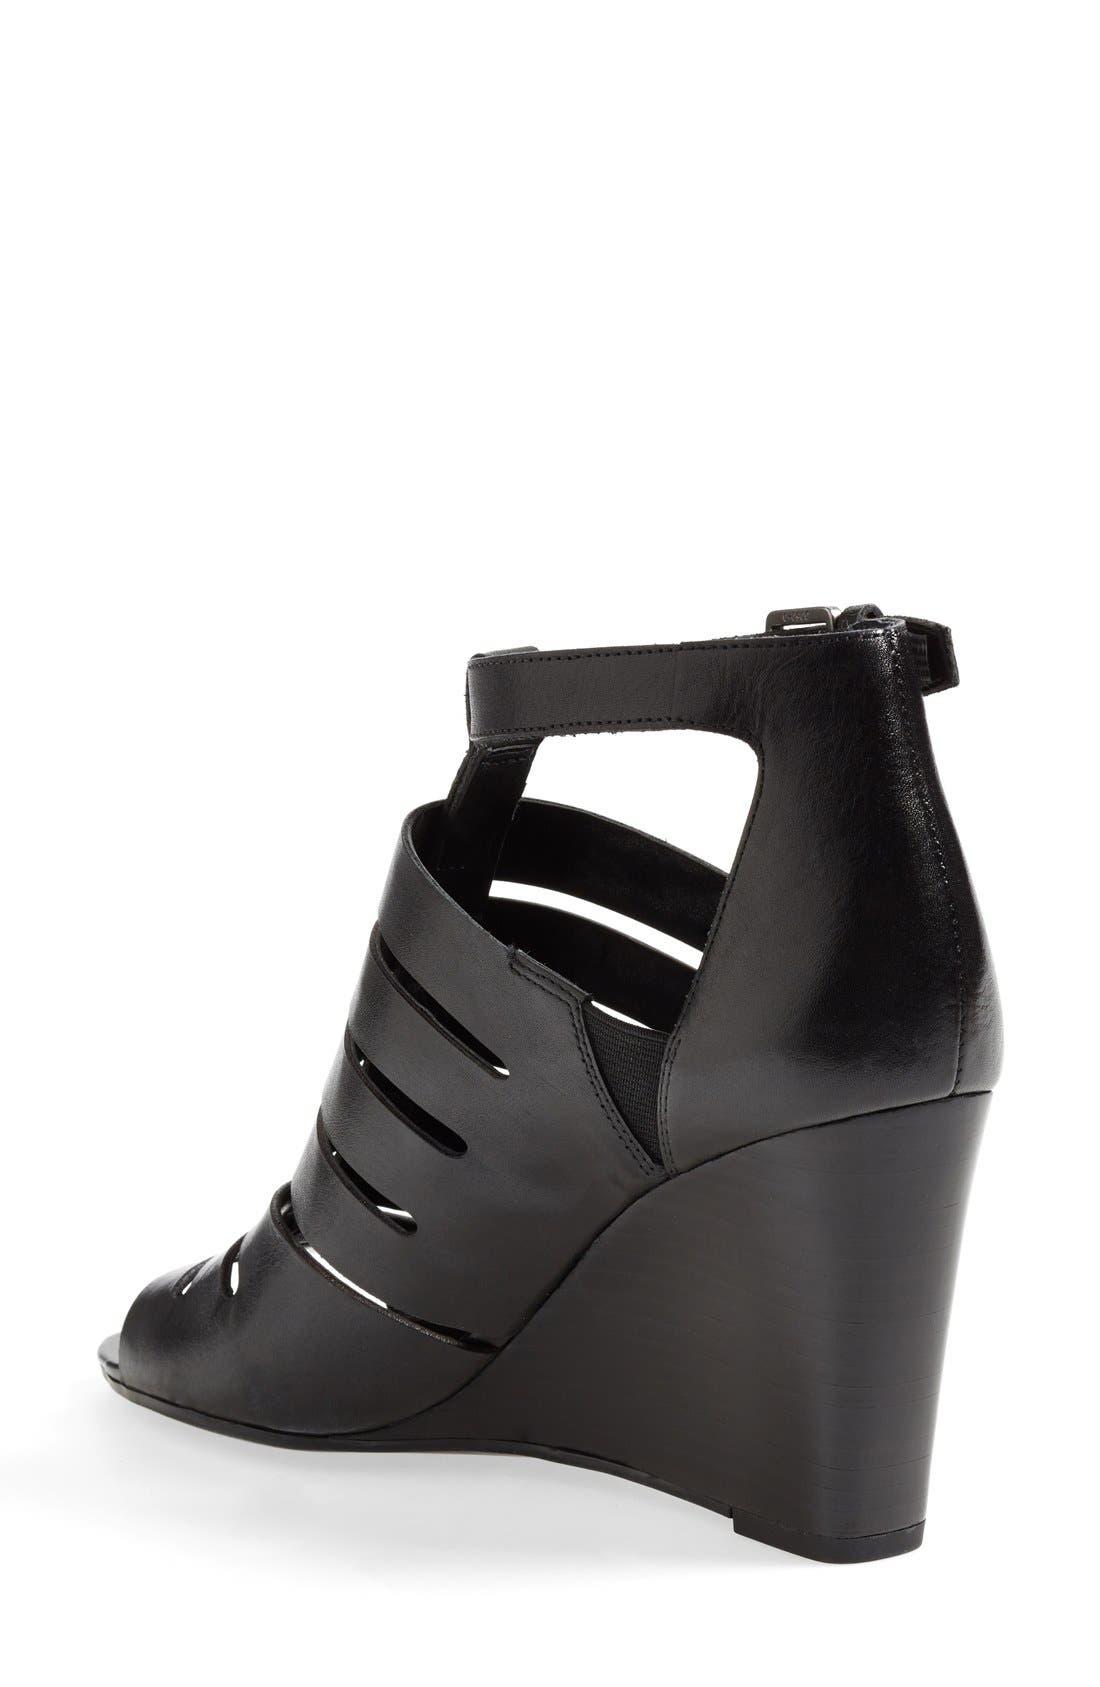 Alternate Image 2  - Franco Sarto 'Faryn' Wedge Sandal (Online Only) (Women)